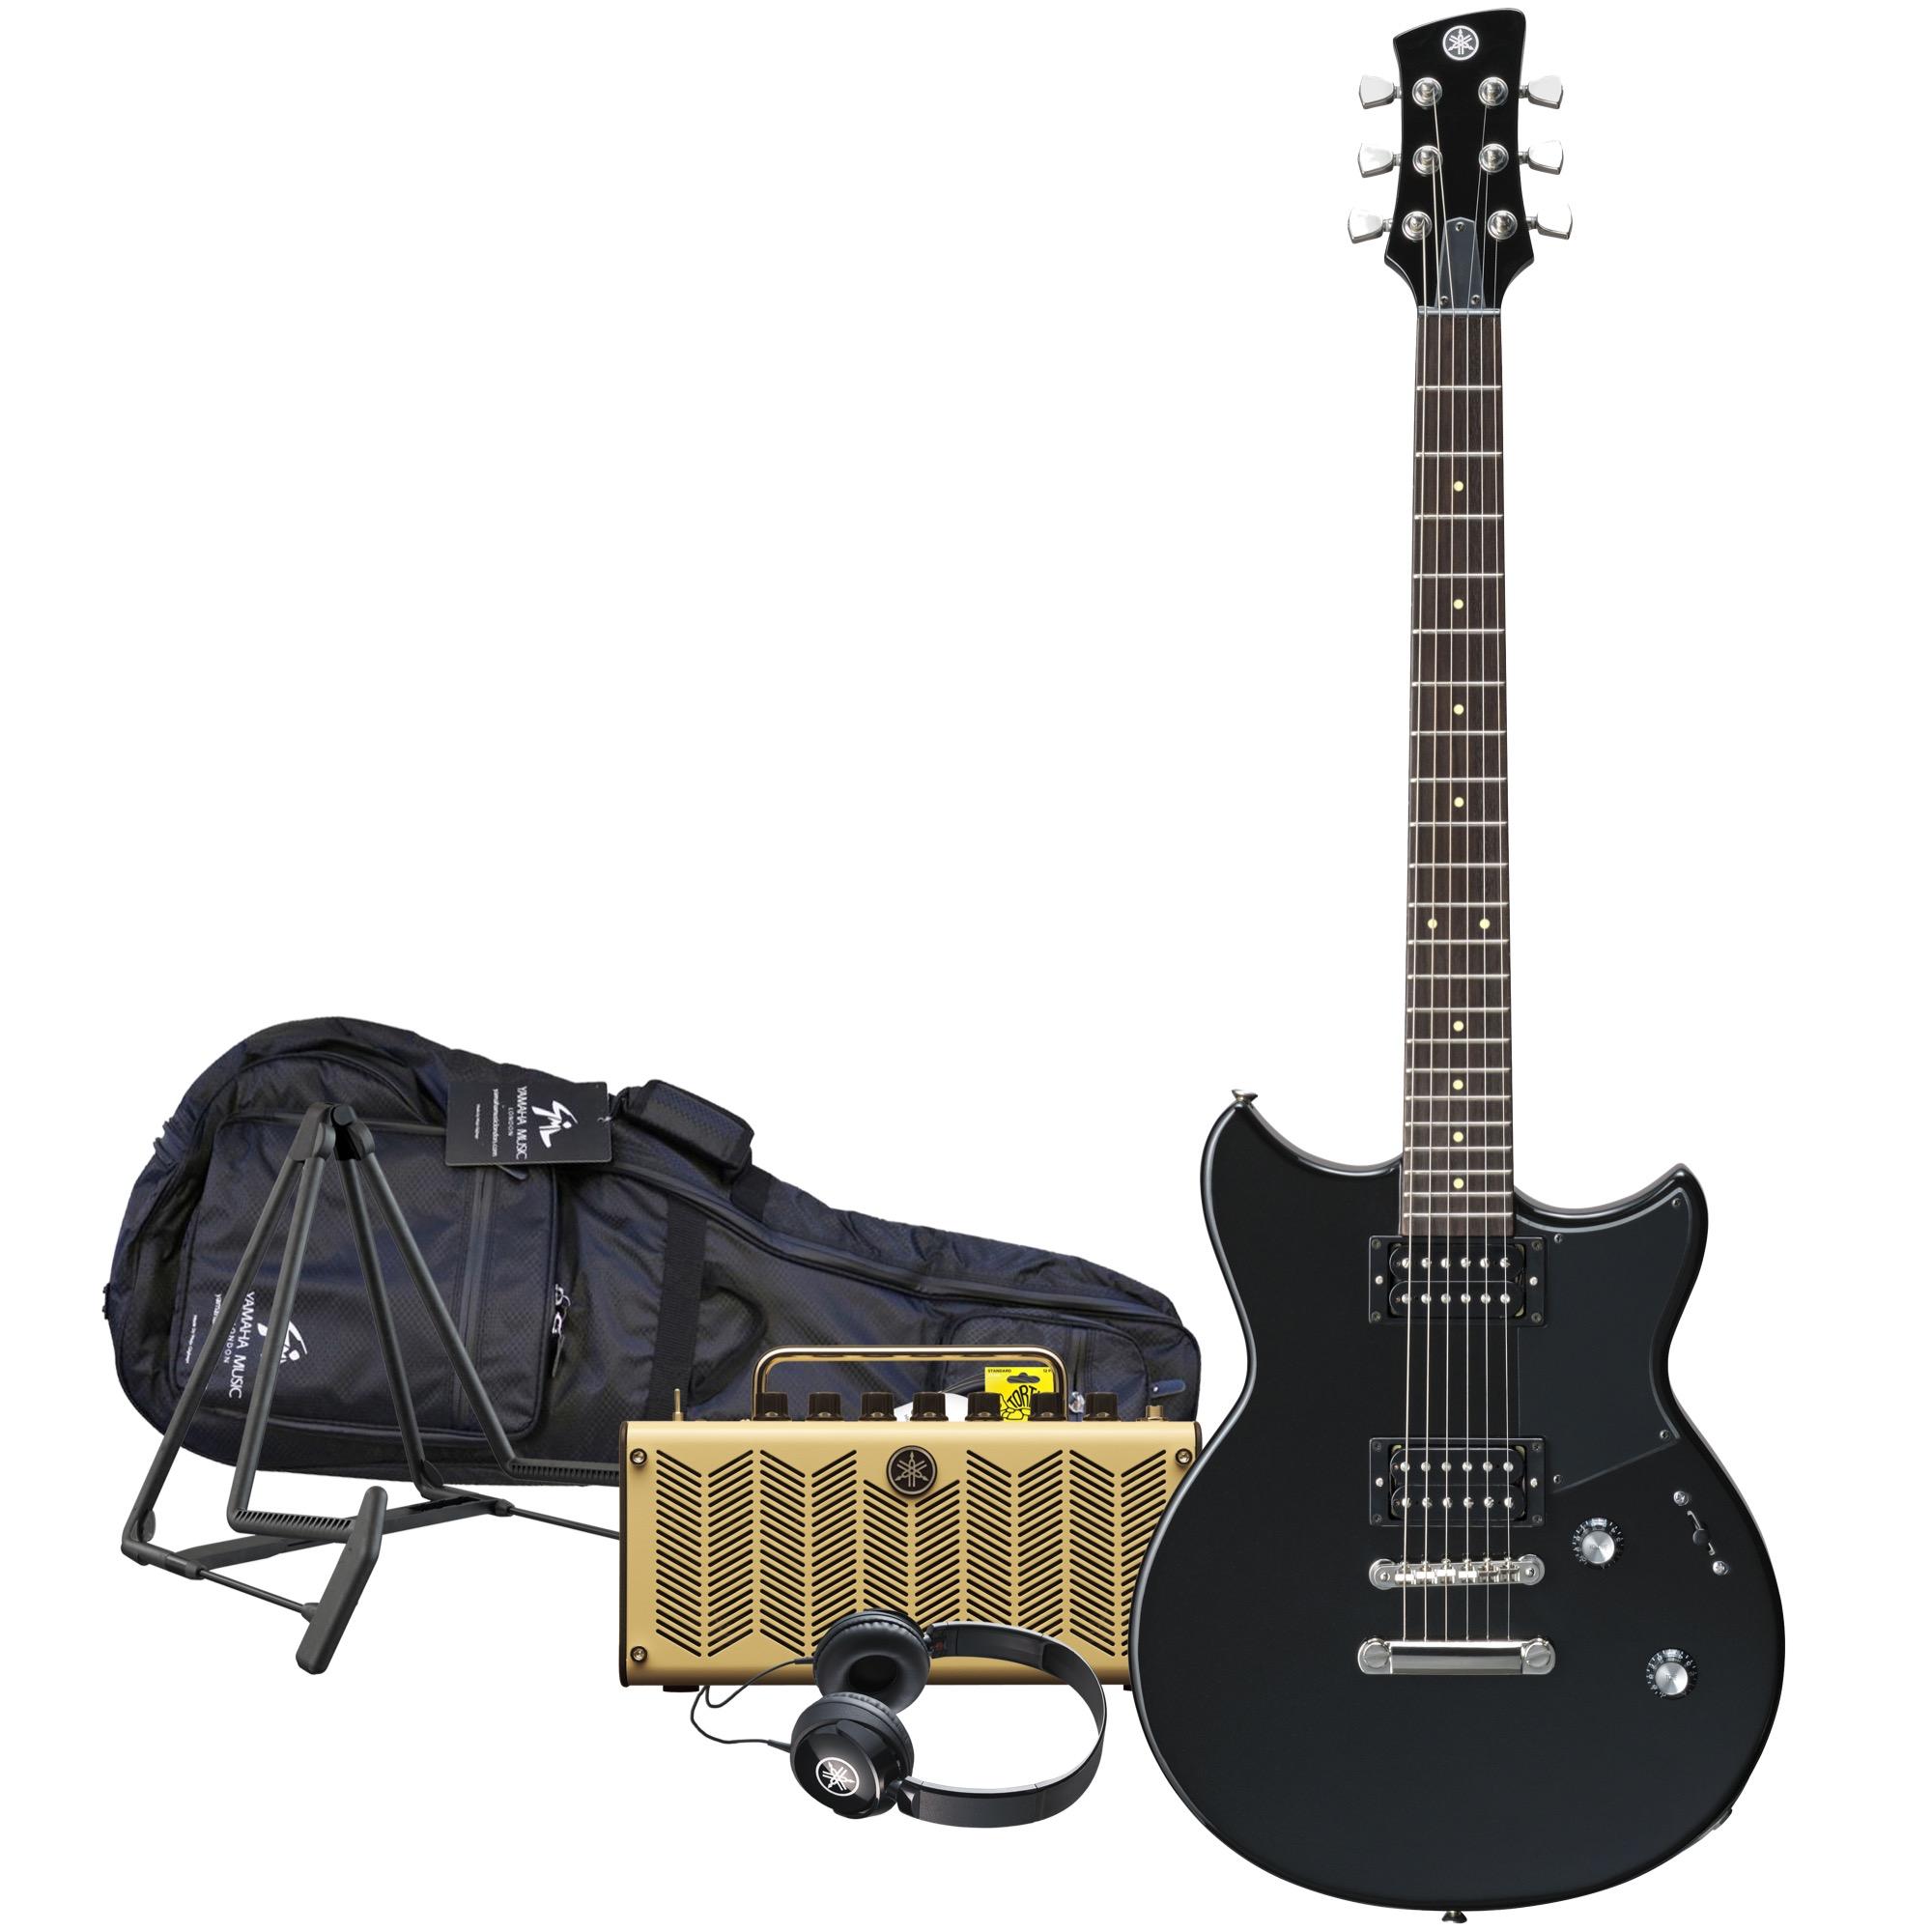 yamaha maverick beginner revstar electric guitar thr5 amp pack featuring the yamaha revstar. Black Bedroom Furniture Sets. Home Design Ideas